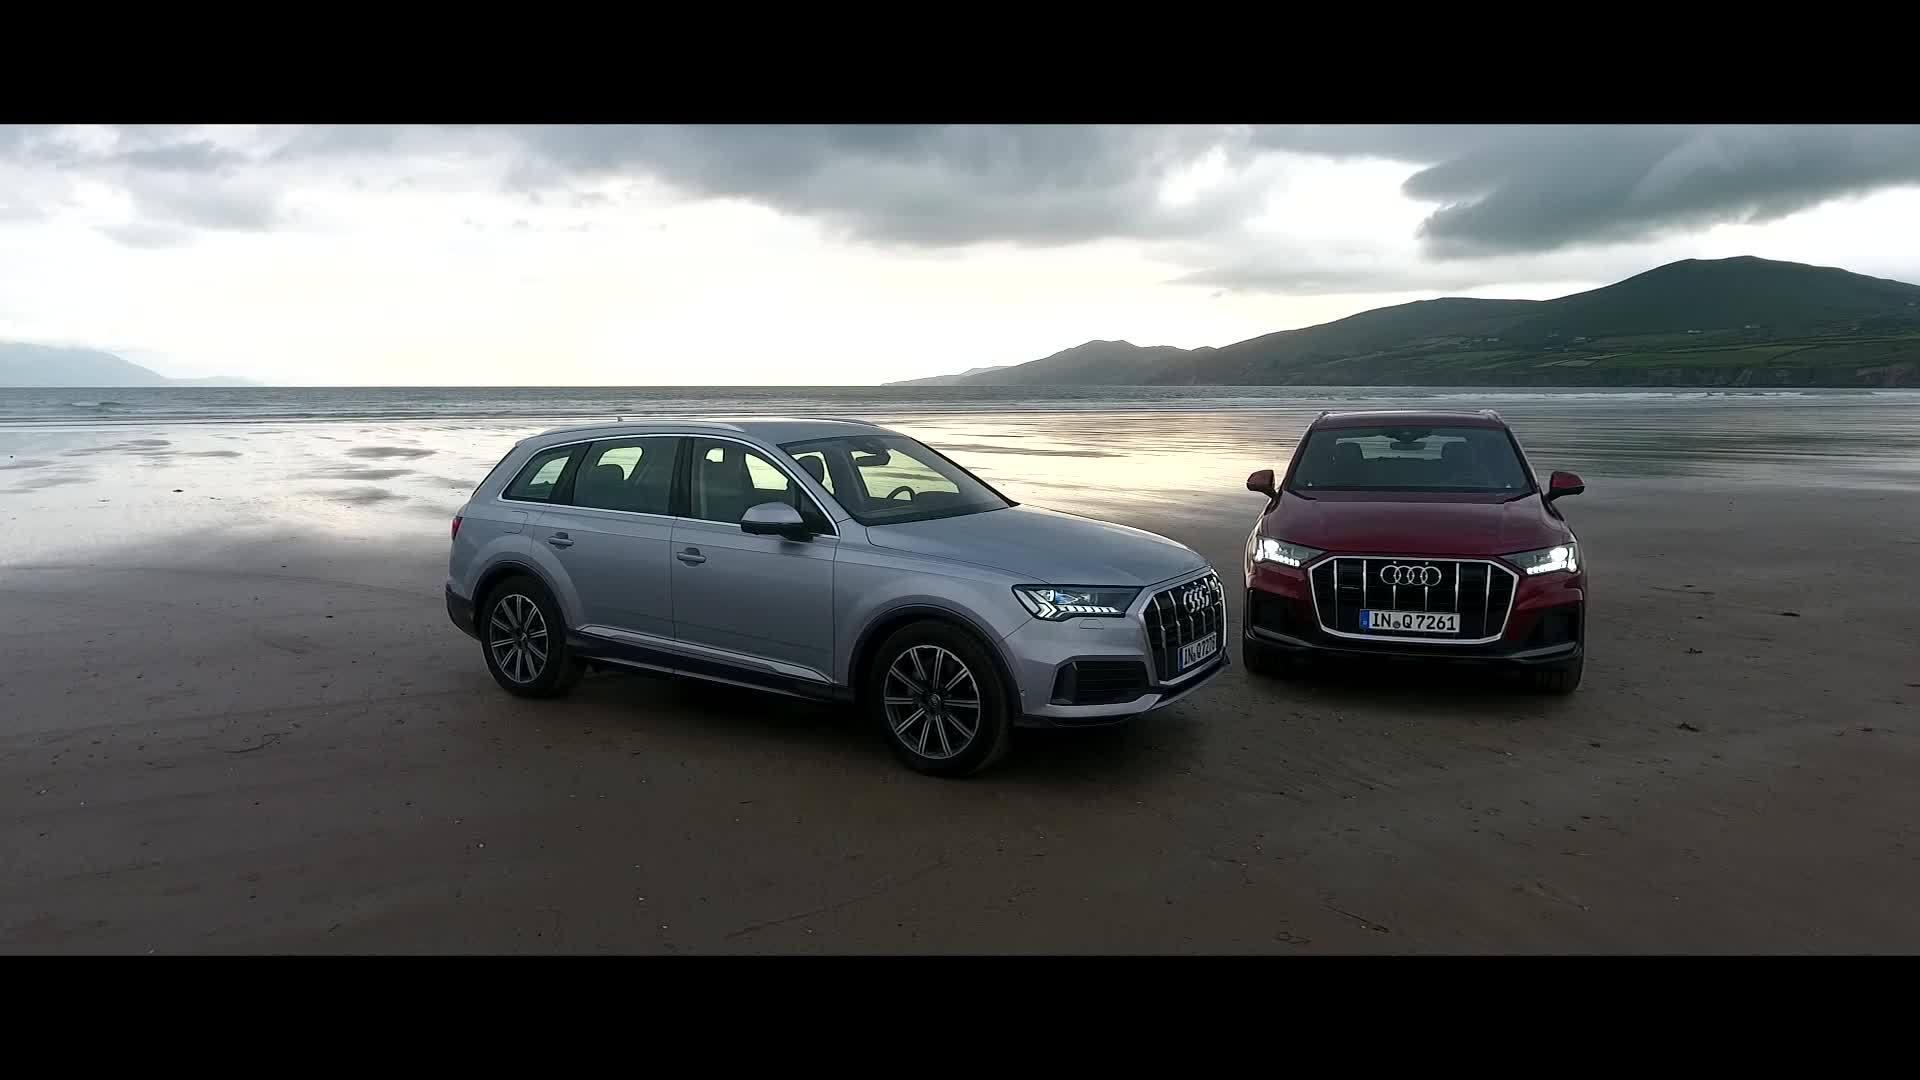 Audi Q7 on Location (Trailer)